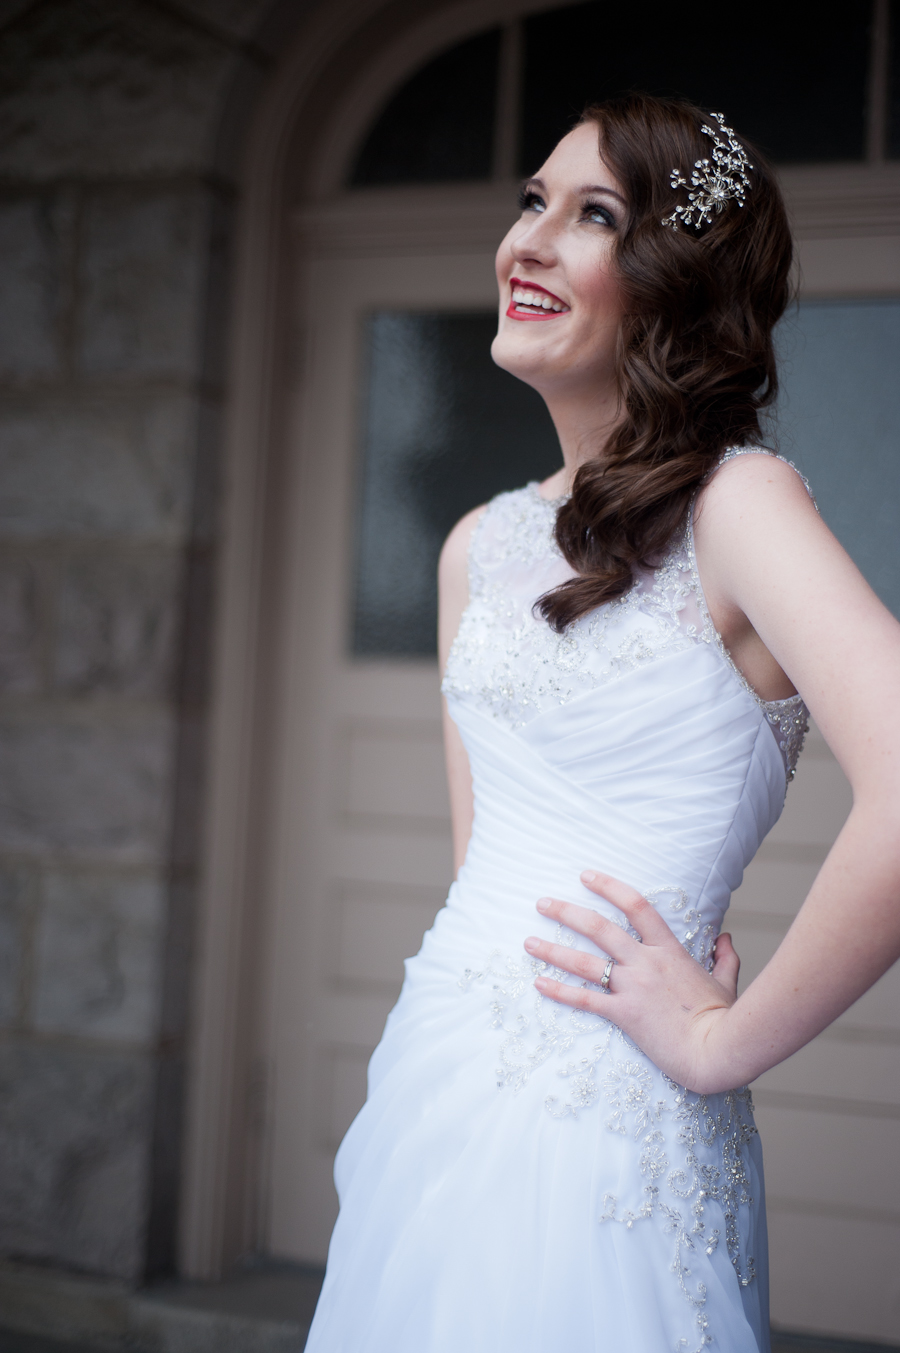 Susannah_Deangelo_Antique_Silver_Music_Hall_Wedding-3.jpg